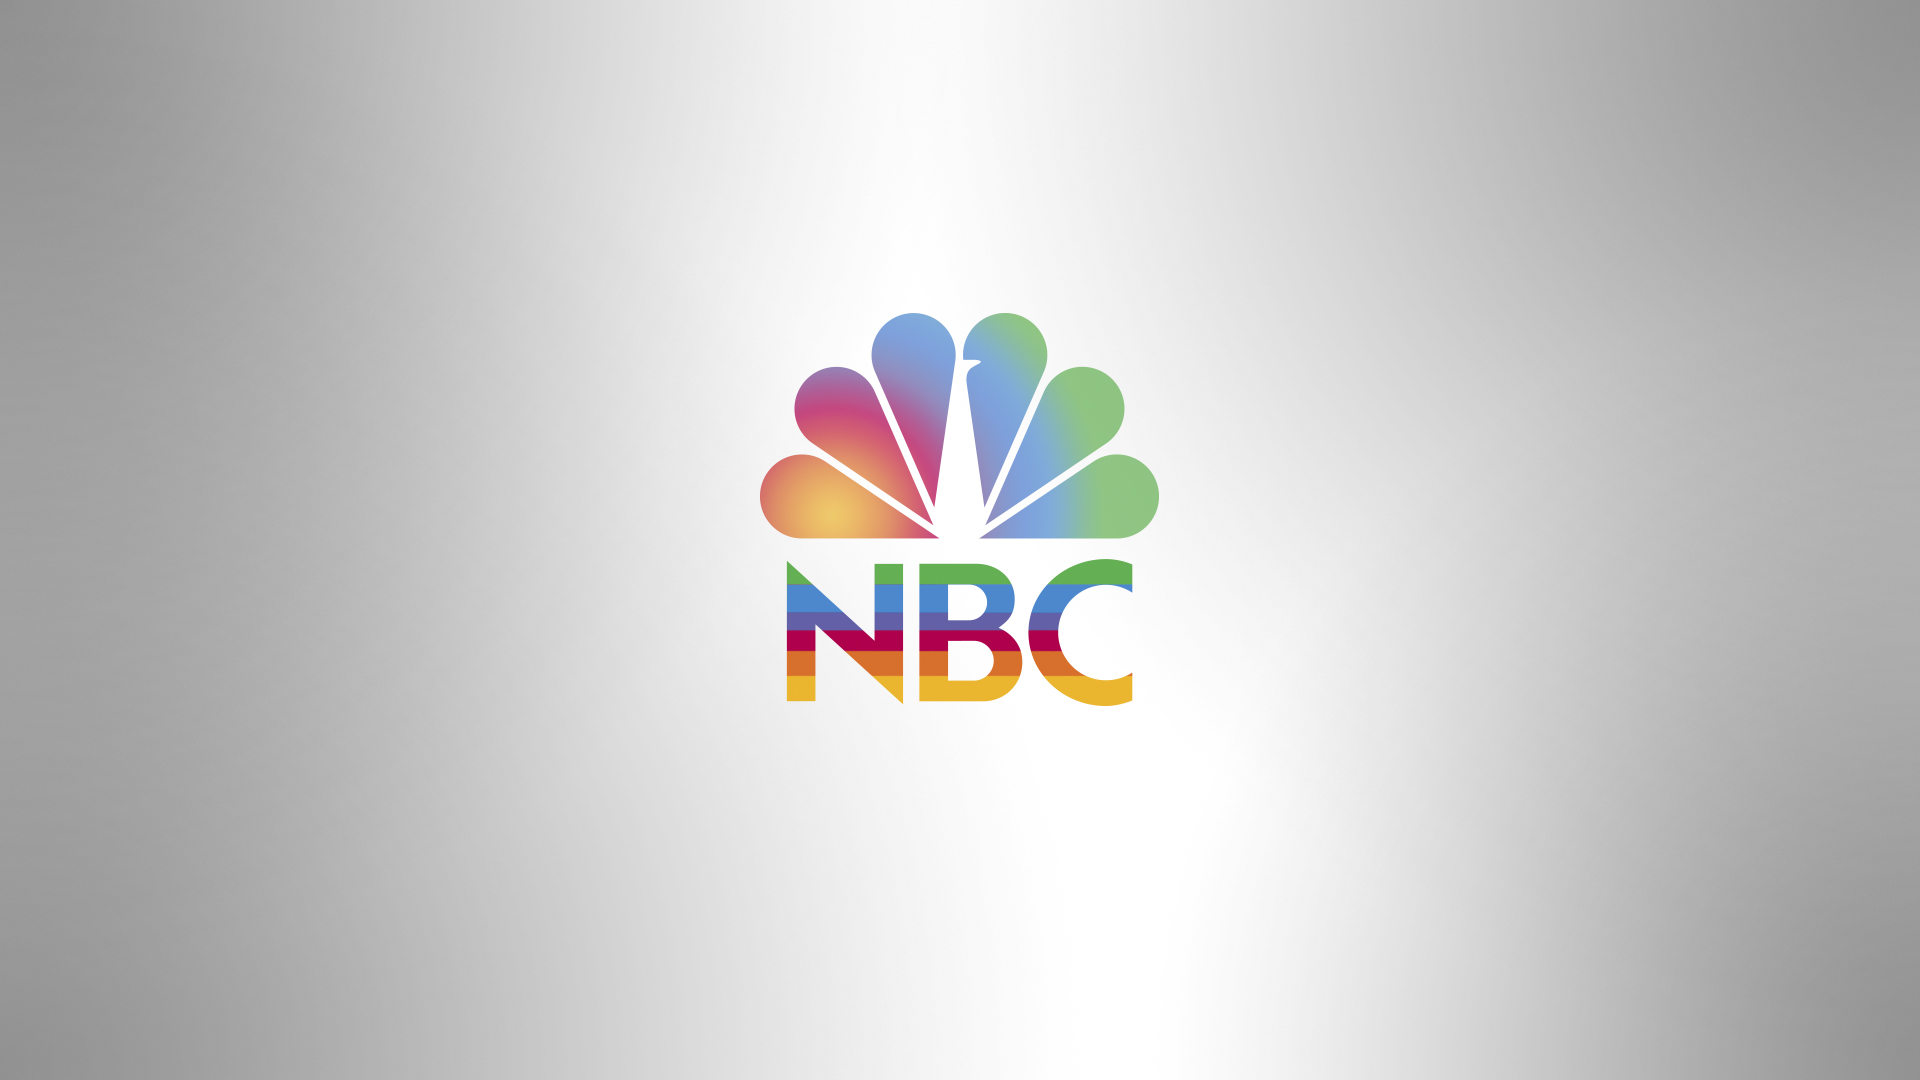 NBC_LOGO2.jpg